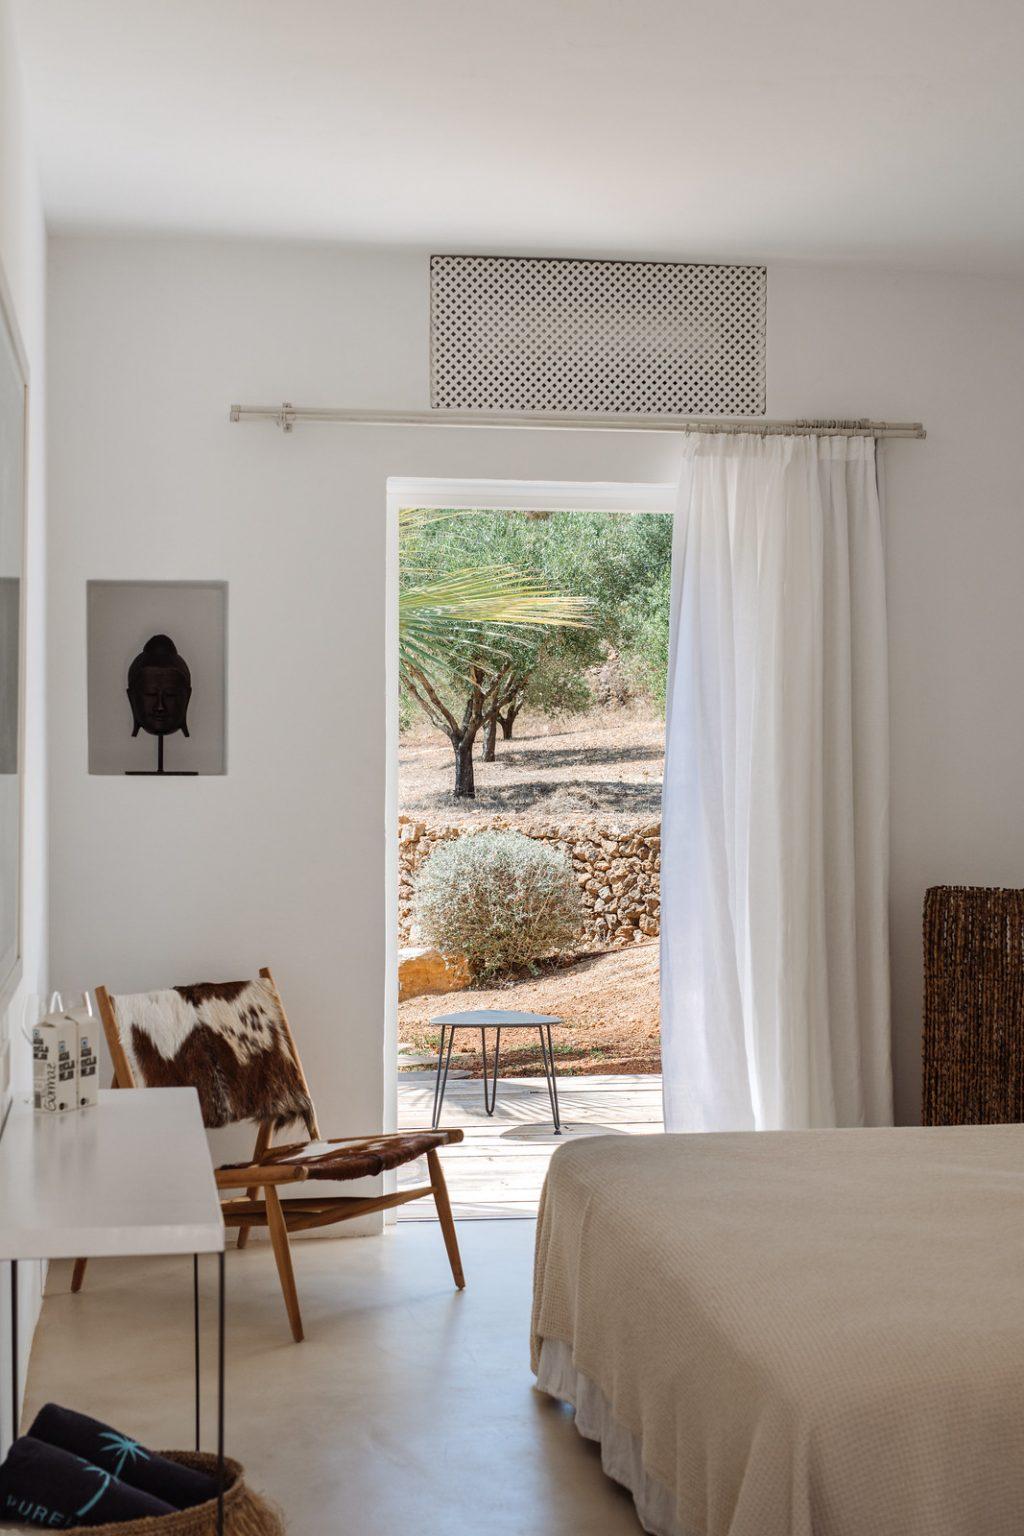 https://www.white-ibiza.com/wp-content/uploads/2020/03/ibiza-hotels-pure-house-ibiza-ana-lui-2021-08-1024x1536.jpg